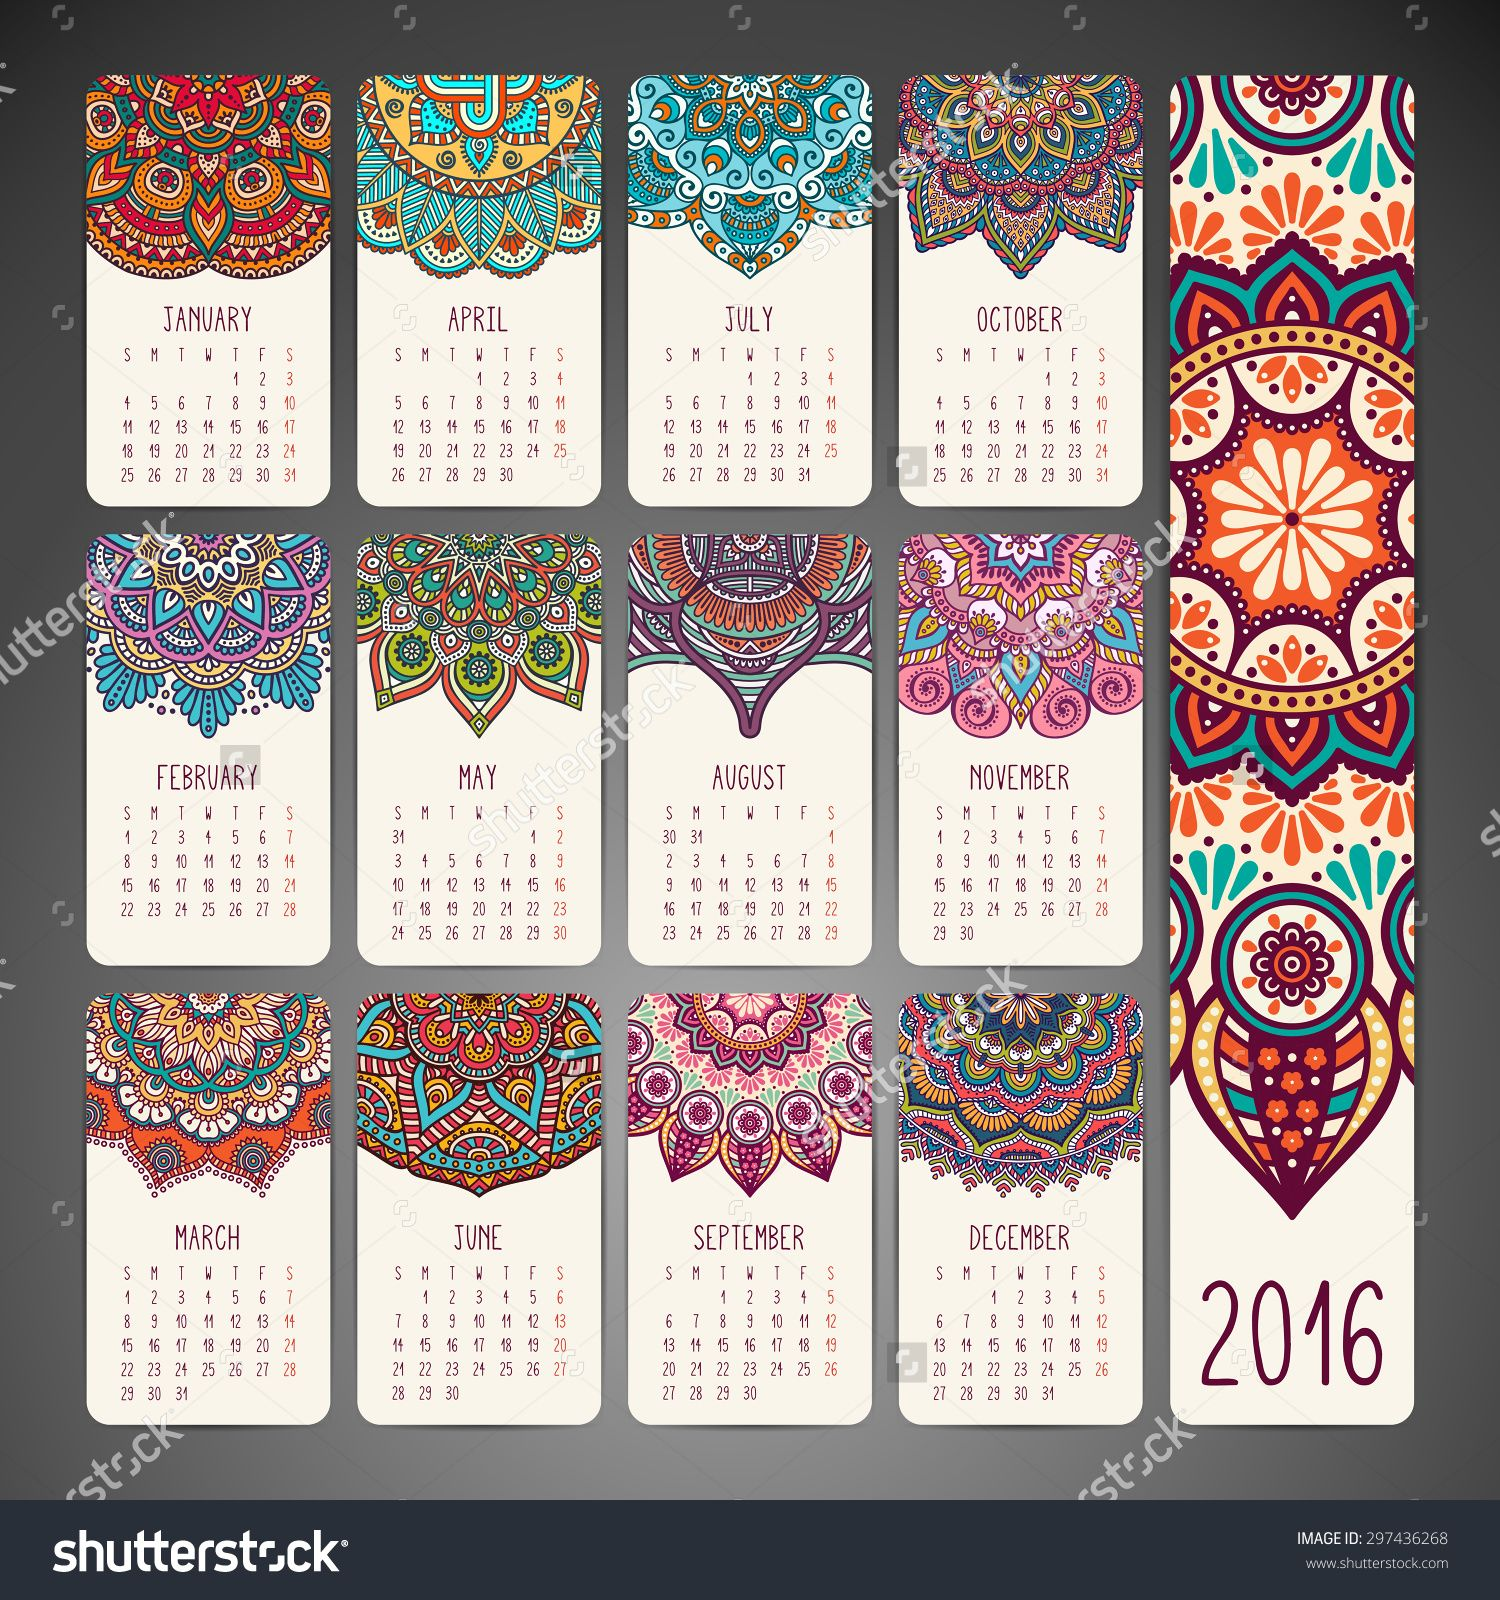 Calendar Design Pattern : Calendar vintage decorative elements oriental